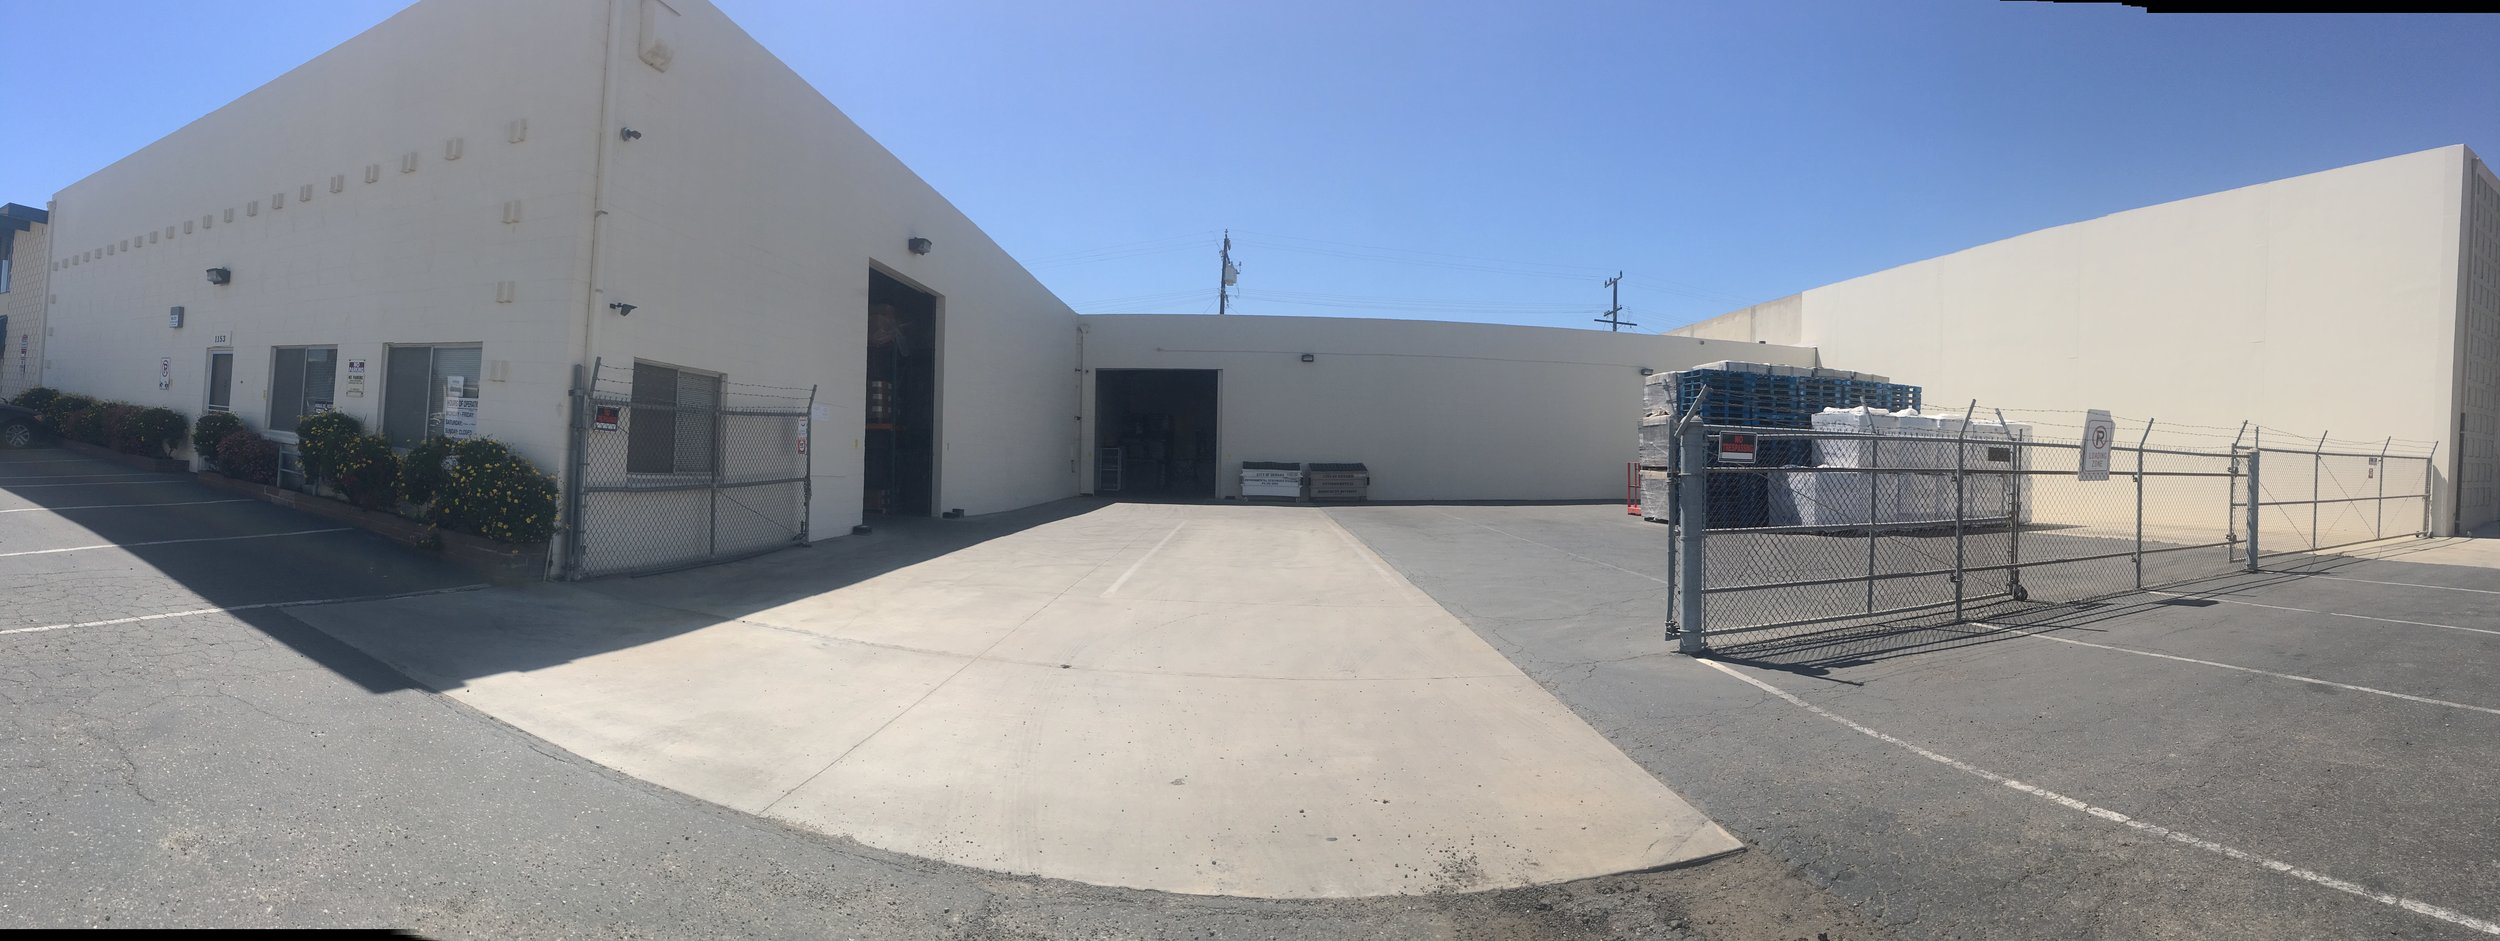 Oxnard Yard - 1153 Commercial AvenueOxnard, CA 93030Phone: 805.483.9909Fax: 805.483.9902